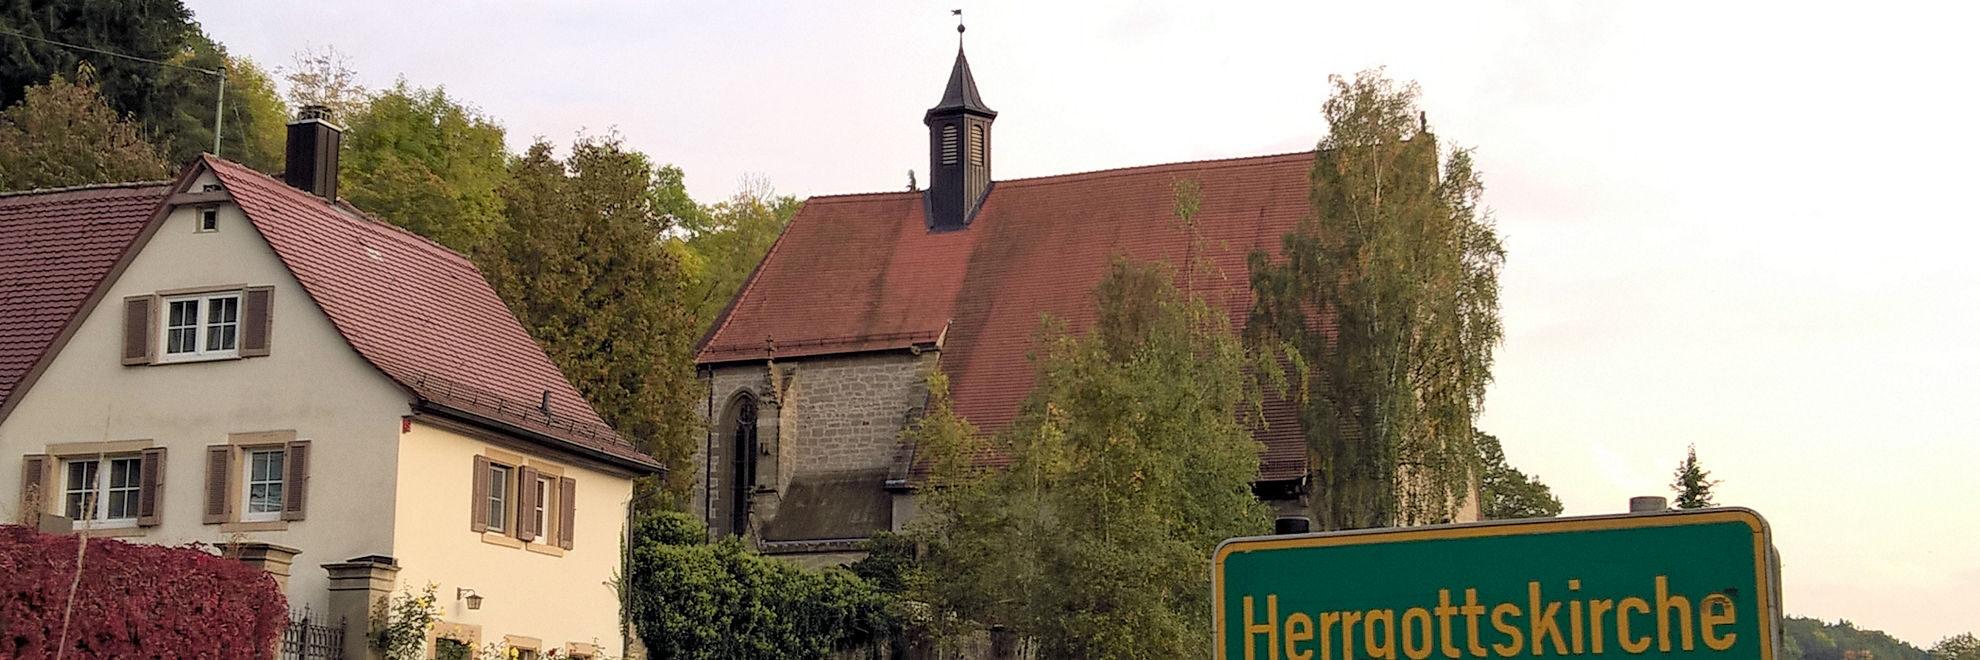 Creglingen: Herrgottskirche